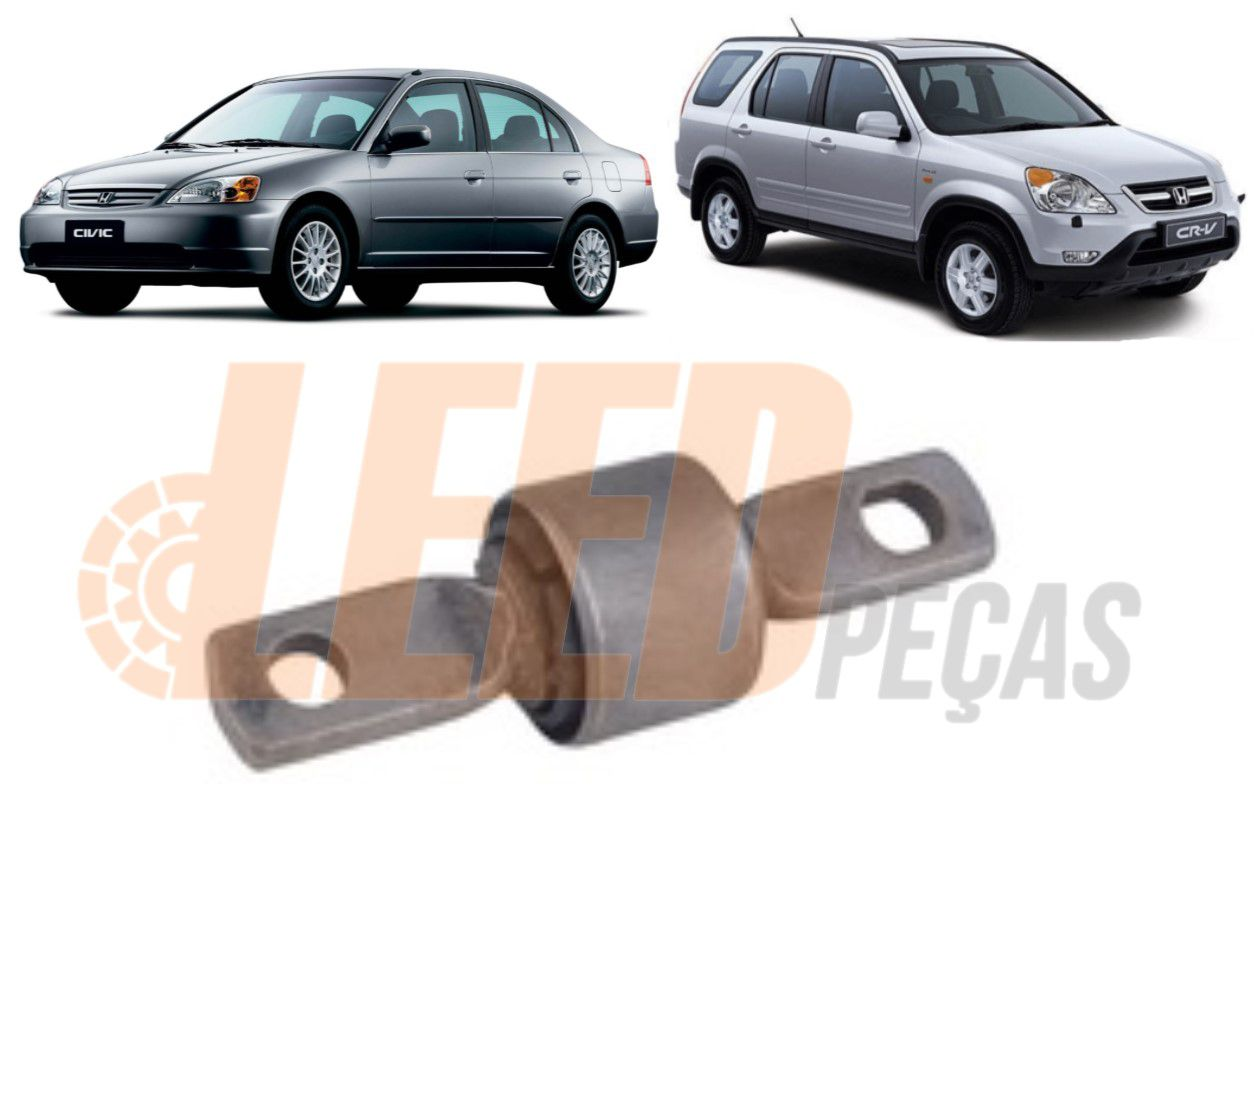 Bucha Braco Superior Suspensao Traseira Civic 2001 2002 2003 2004 2005 CRV 2002 2003 2004 2005 42,2mm